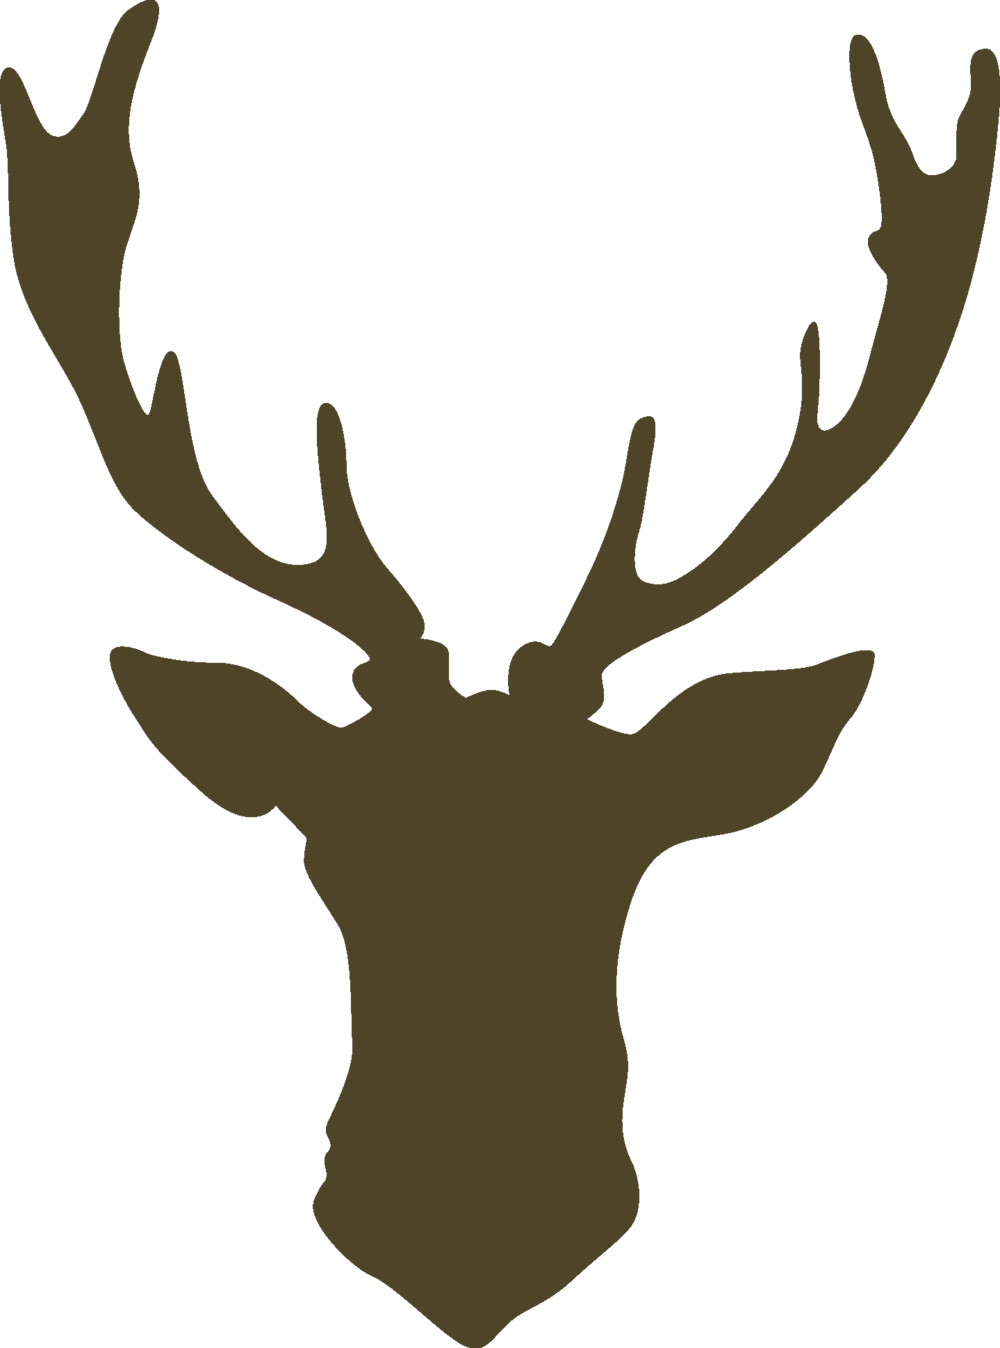 logo_eli_jelinek copy.png